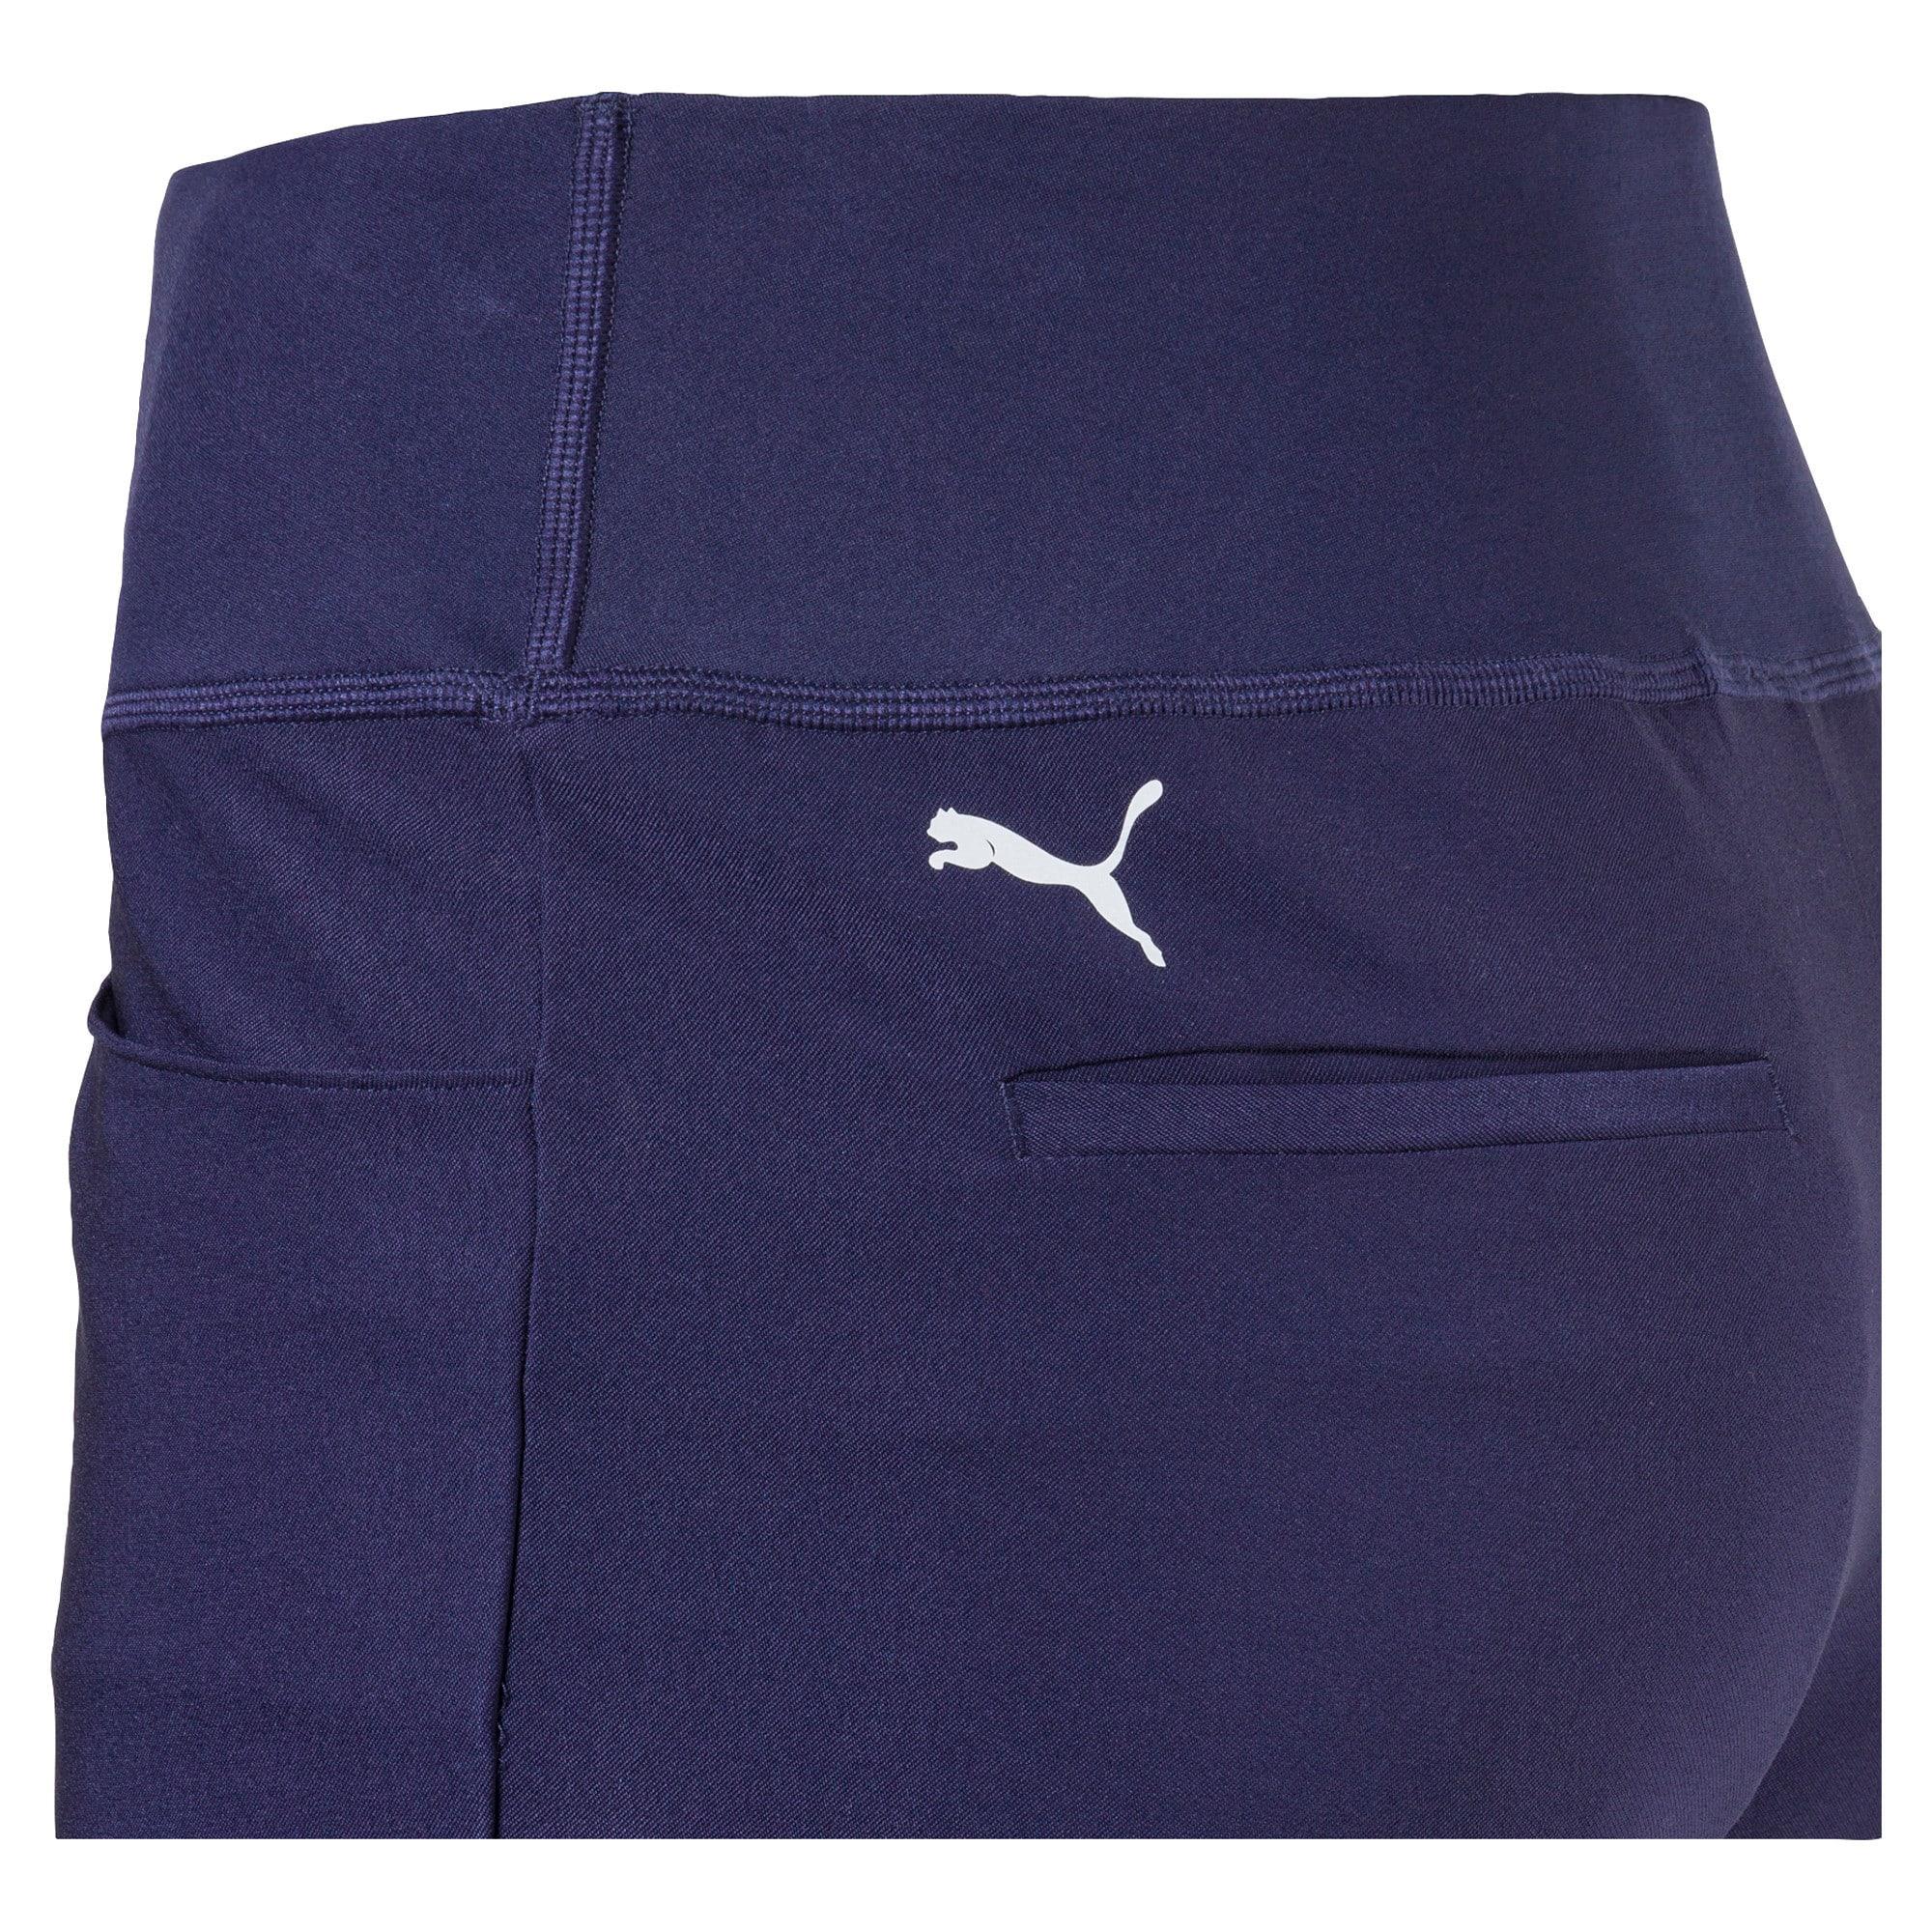 Thumbnail 6 of Golf Women's PWRSHAPE Pull On Pants, Peacoat, medium